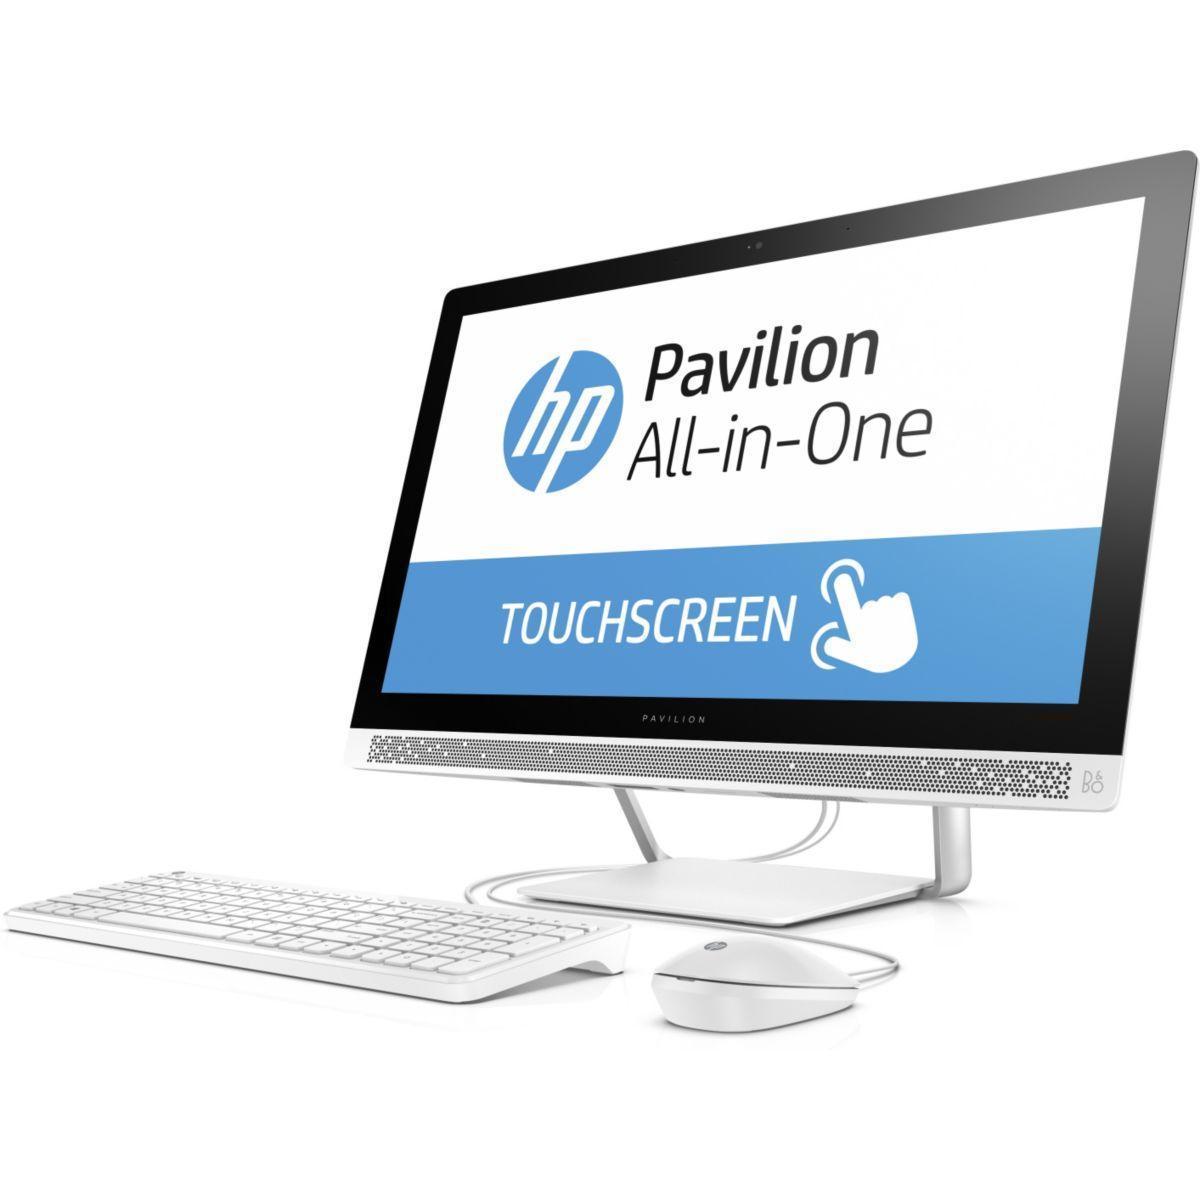 HP Pavilion 24-b111nf 23.8-inch Core i3 3.2 GHz  - HDD 1 TB - 4GB